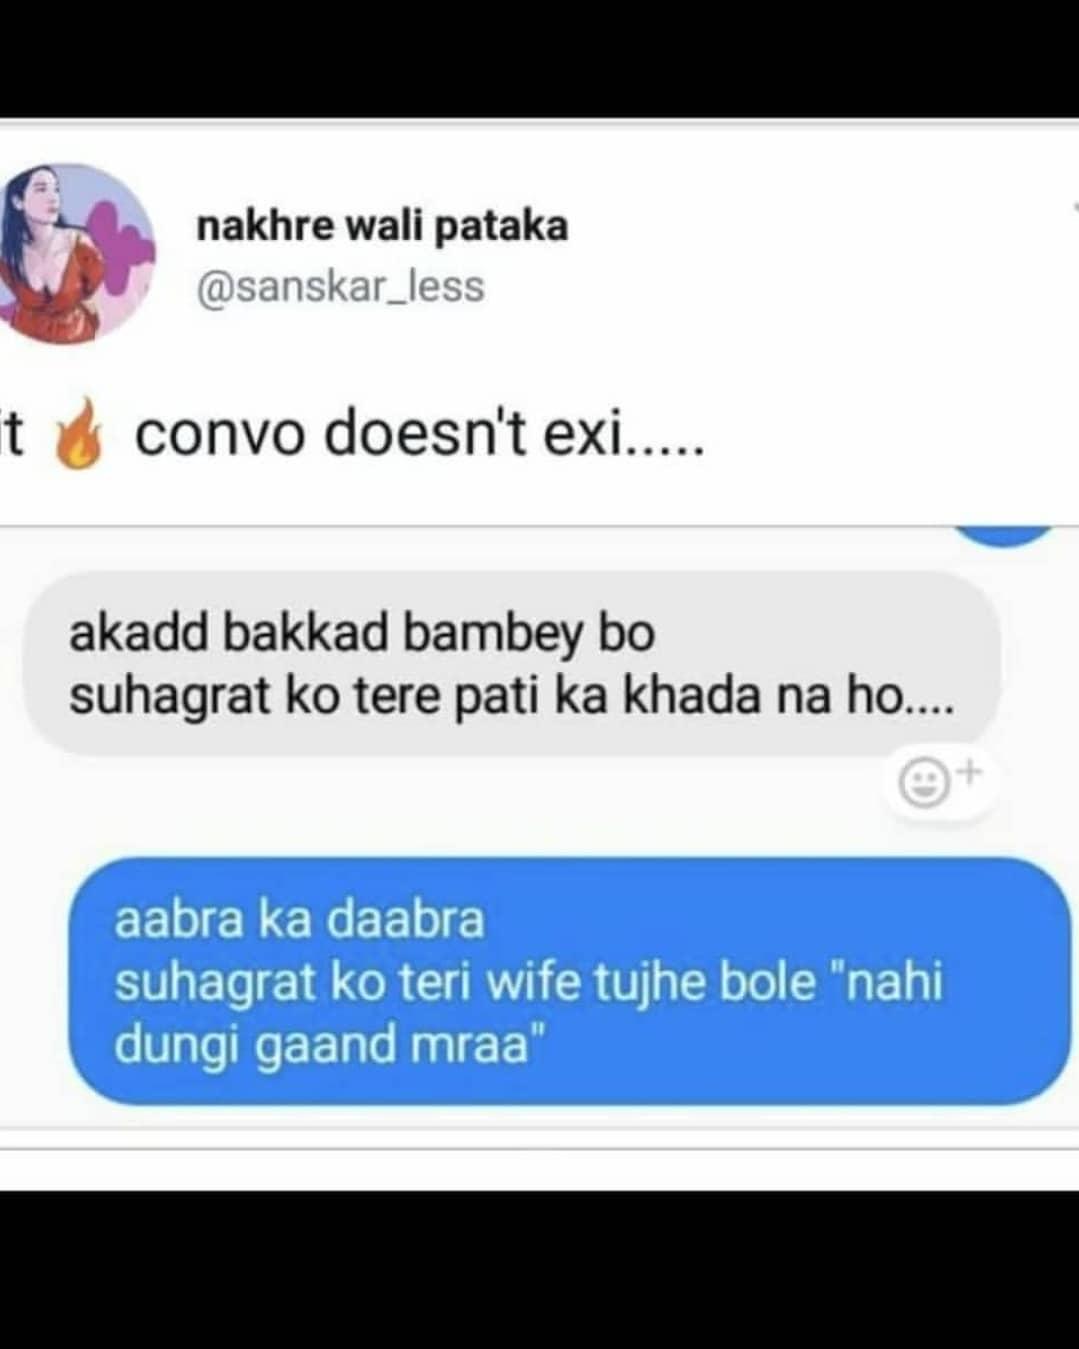 www-funny-memes-in-hindi-com-399-Dubal2-BMining2-BMemes2-B2528232529